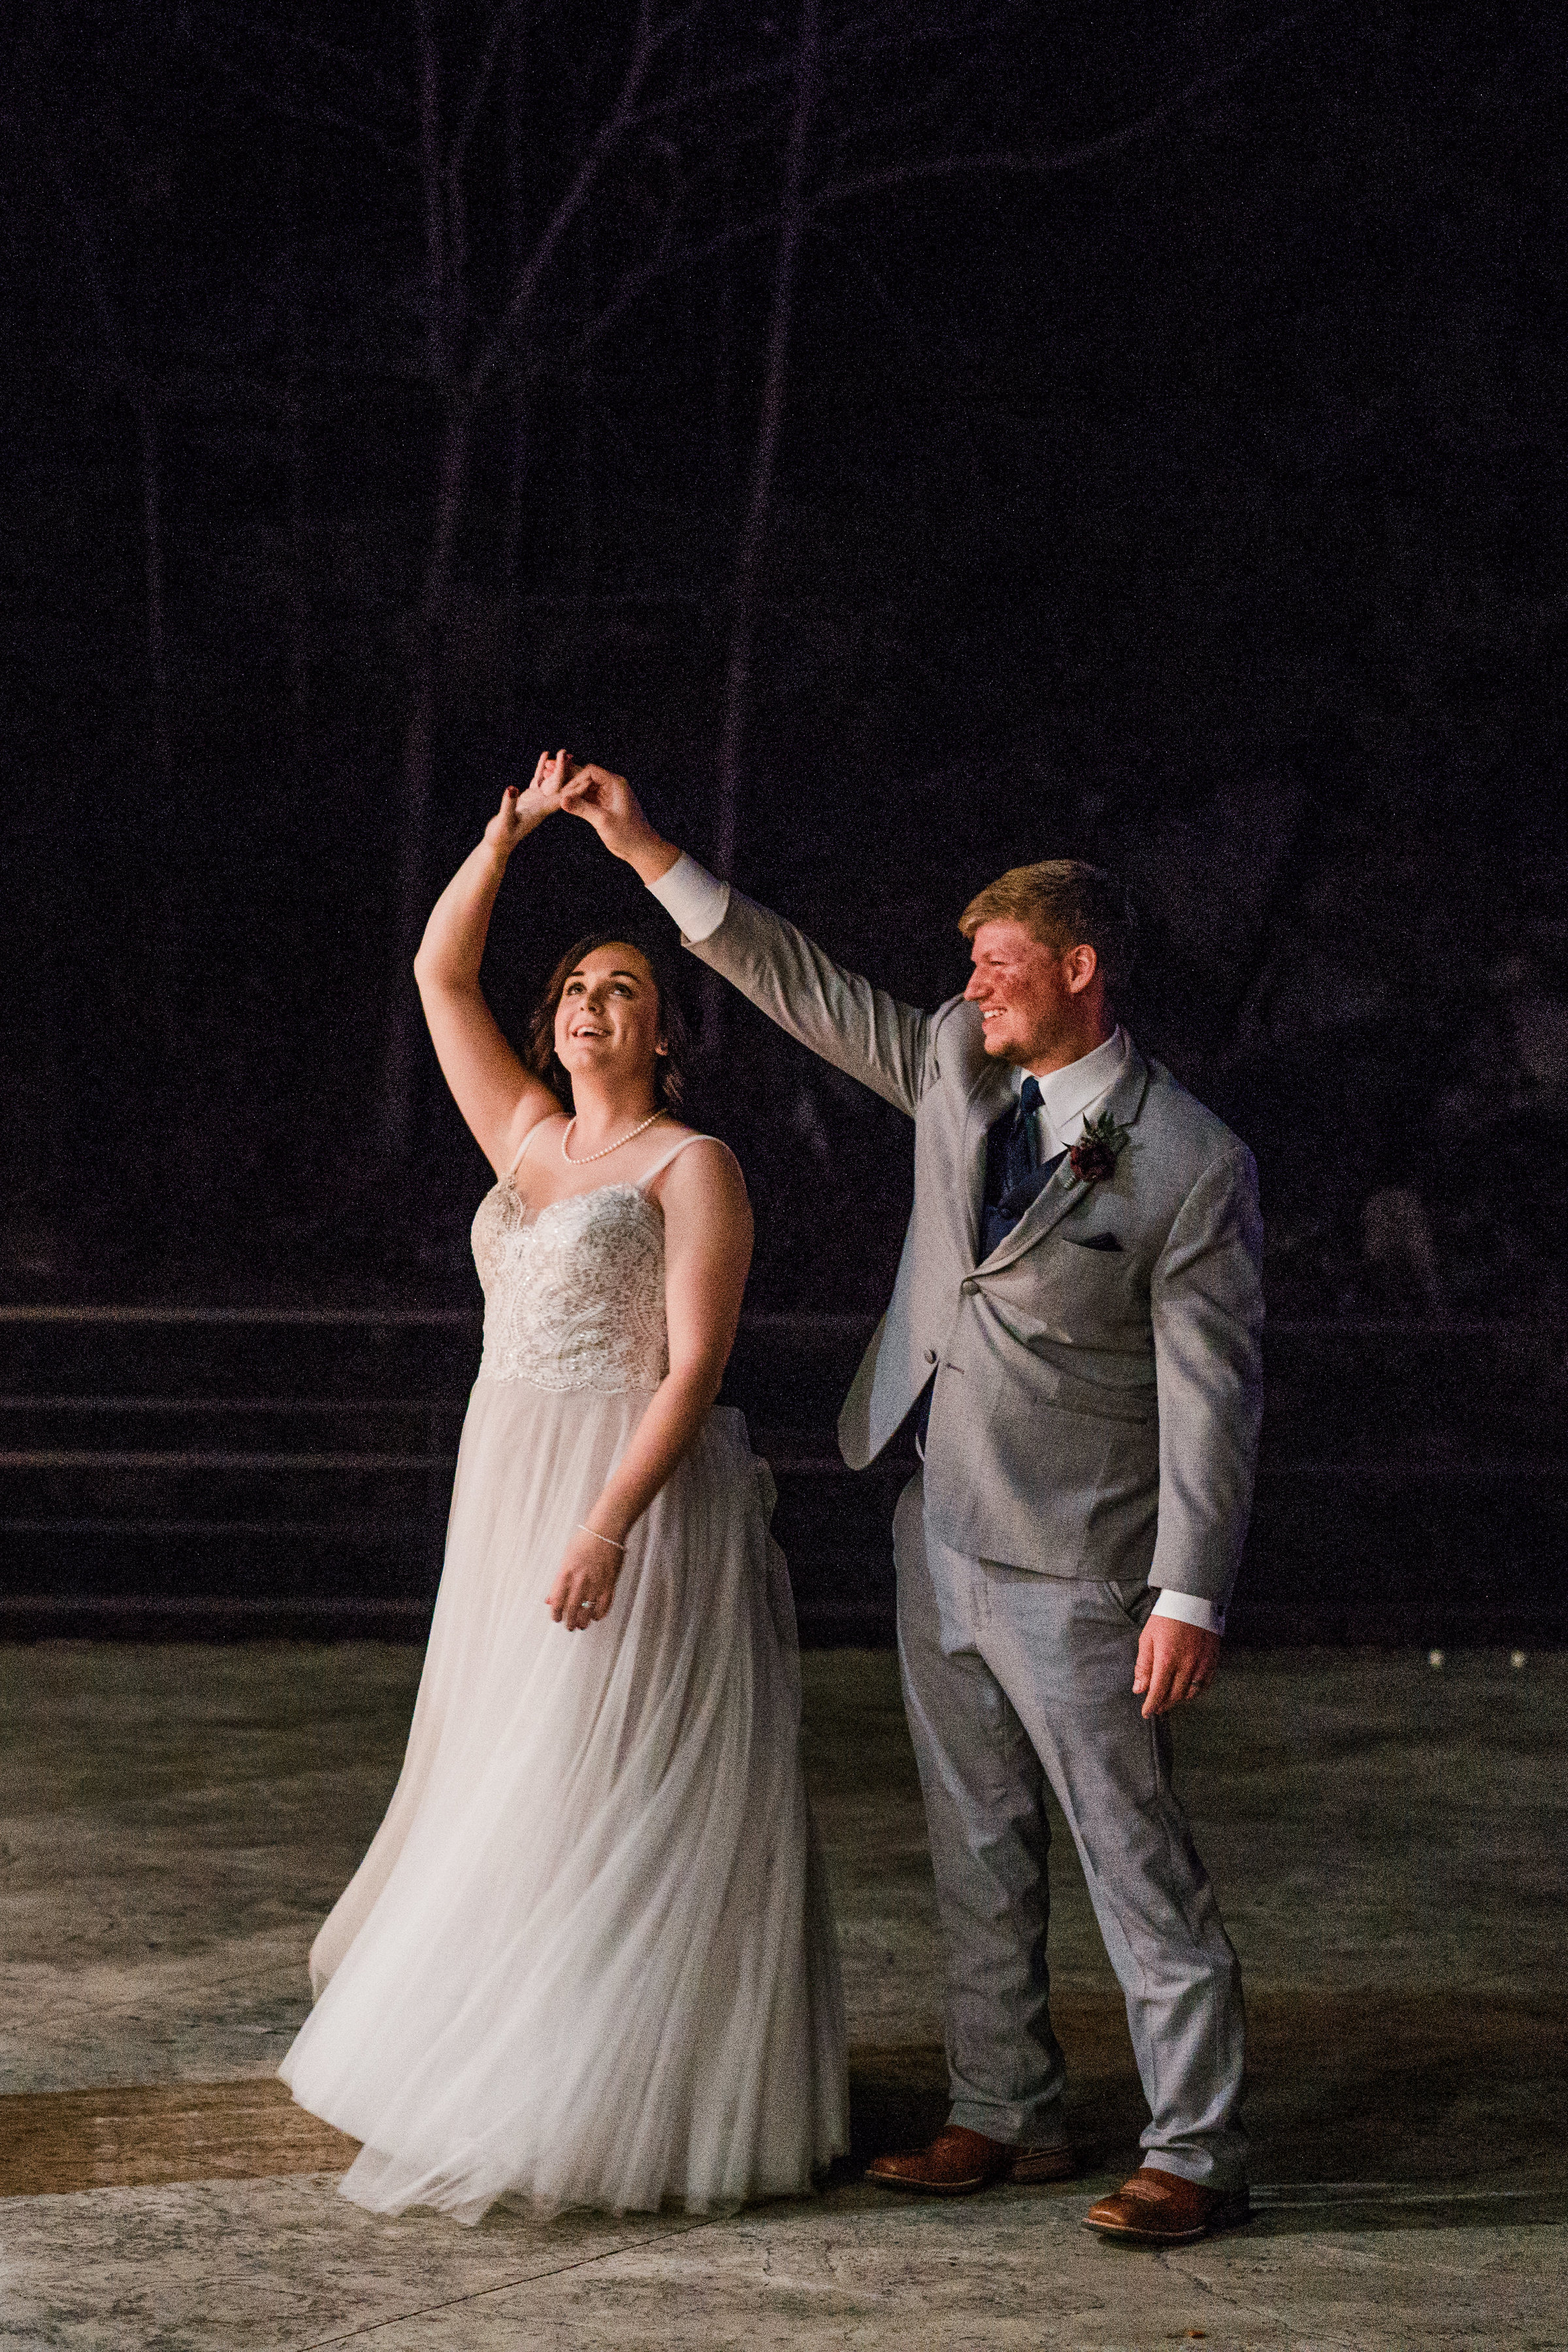 Graystone-Quarry-Wedding 81.jpg